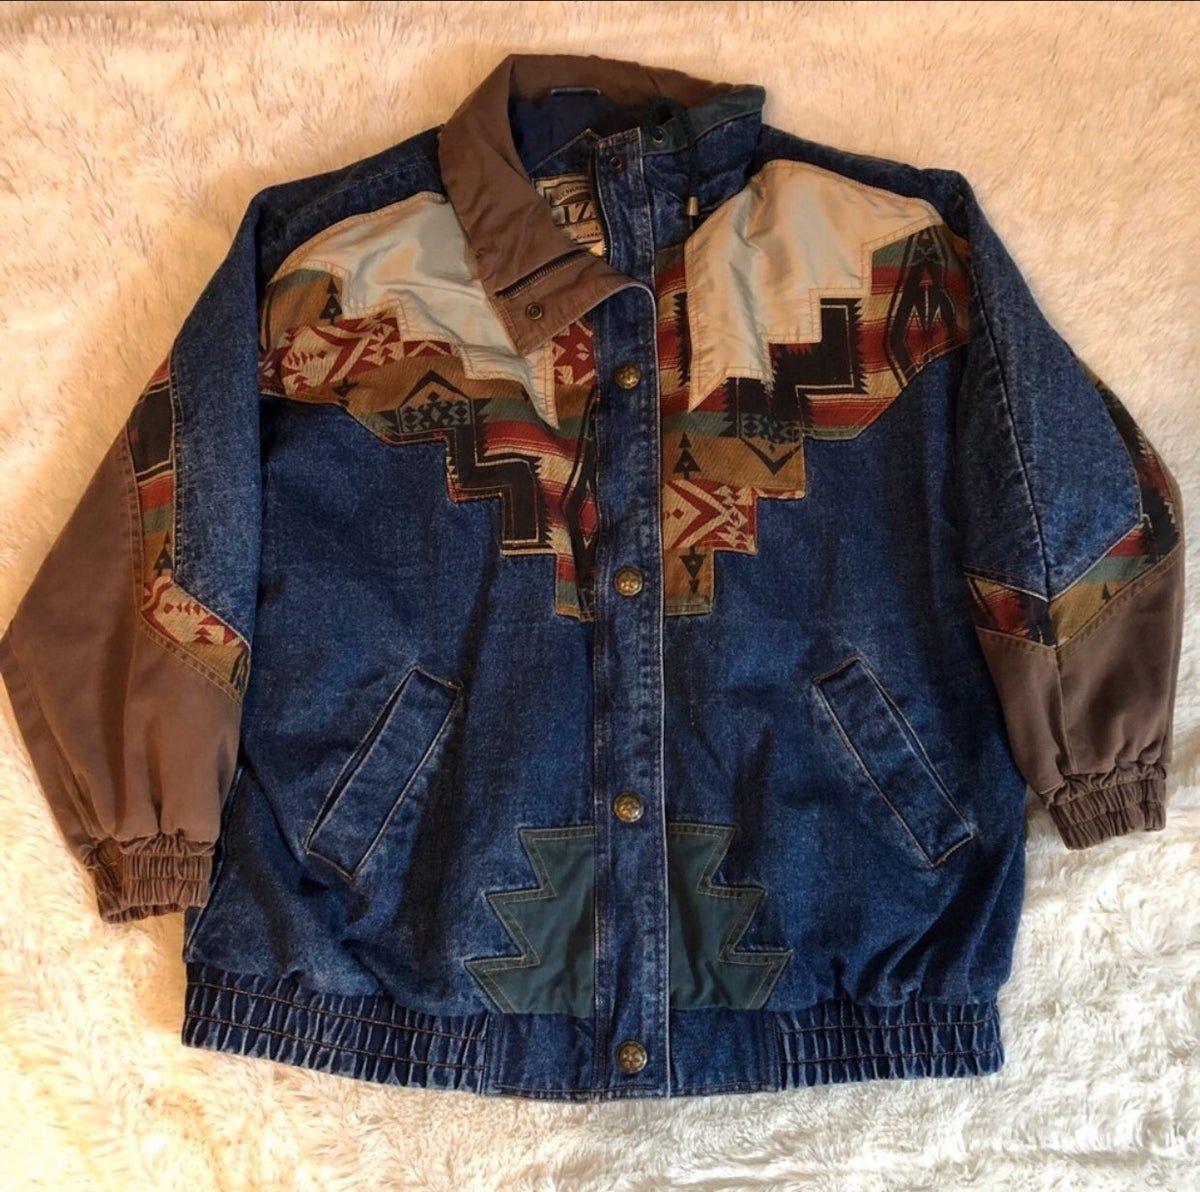 Izzi Vintage Southwestern Denim Bomber J On Mercari Denim Coat Vintage Denim Vintage Jacket [ 1192 x 1200 Pixel ]